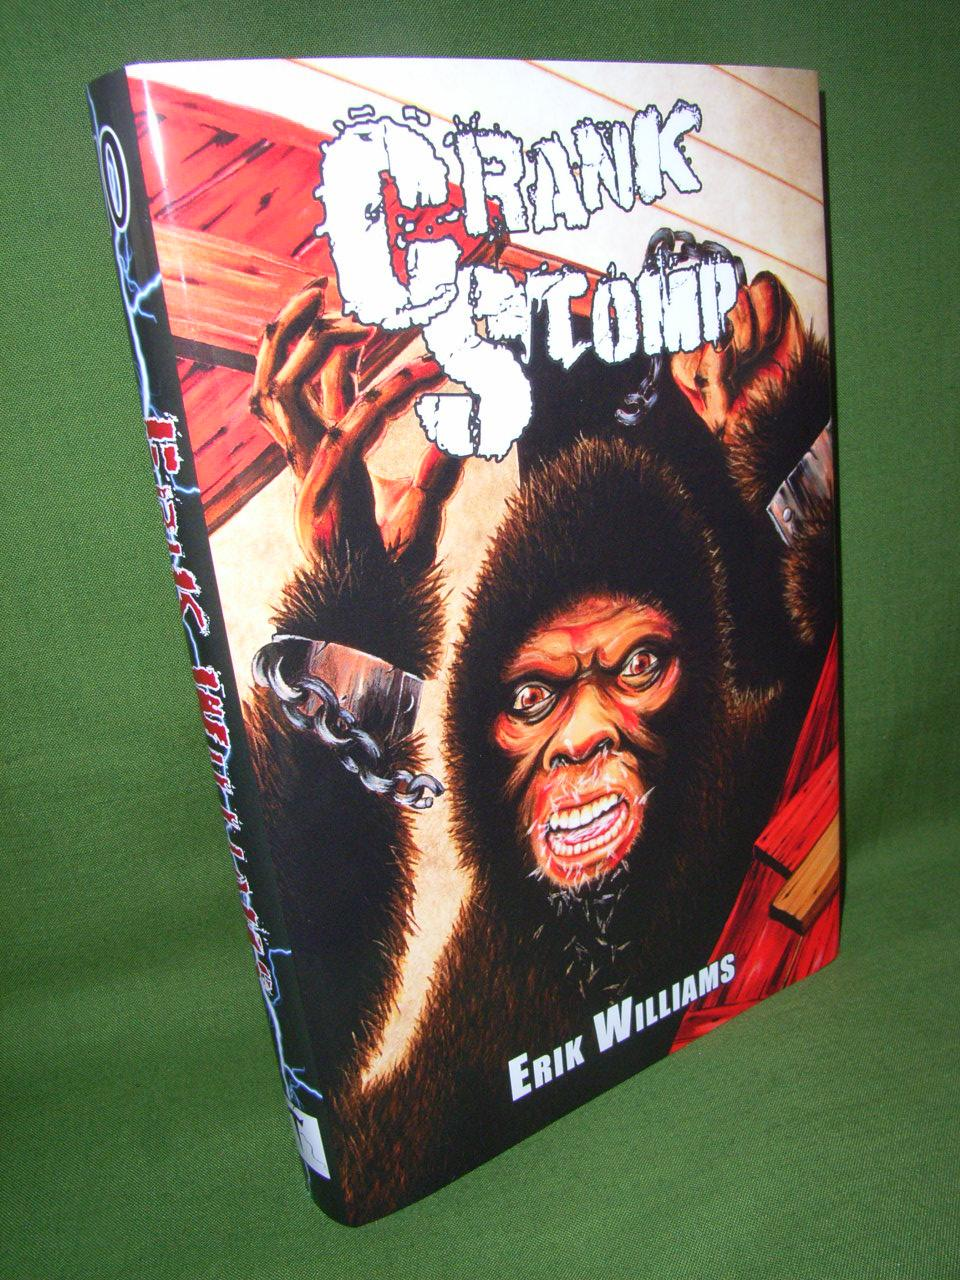 Crank Stomp Signed Numbered Limited Erik WILLIAMS